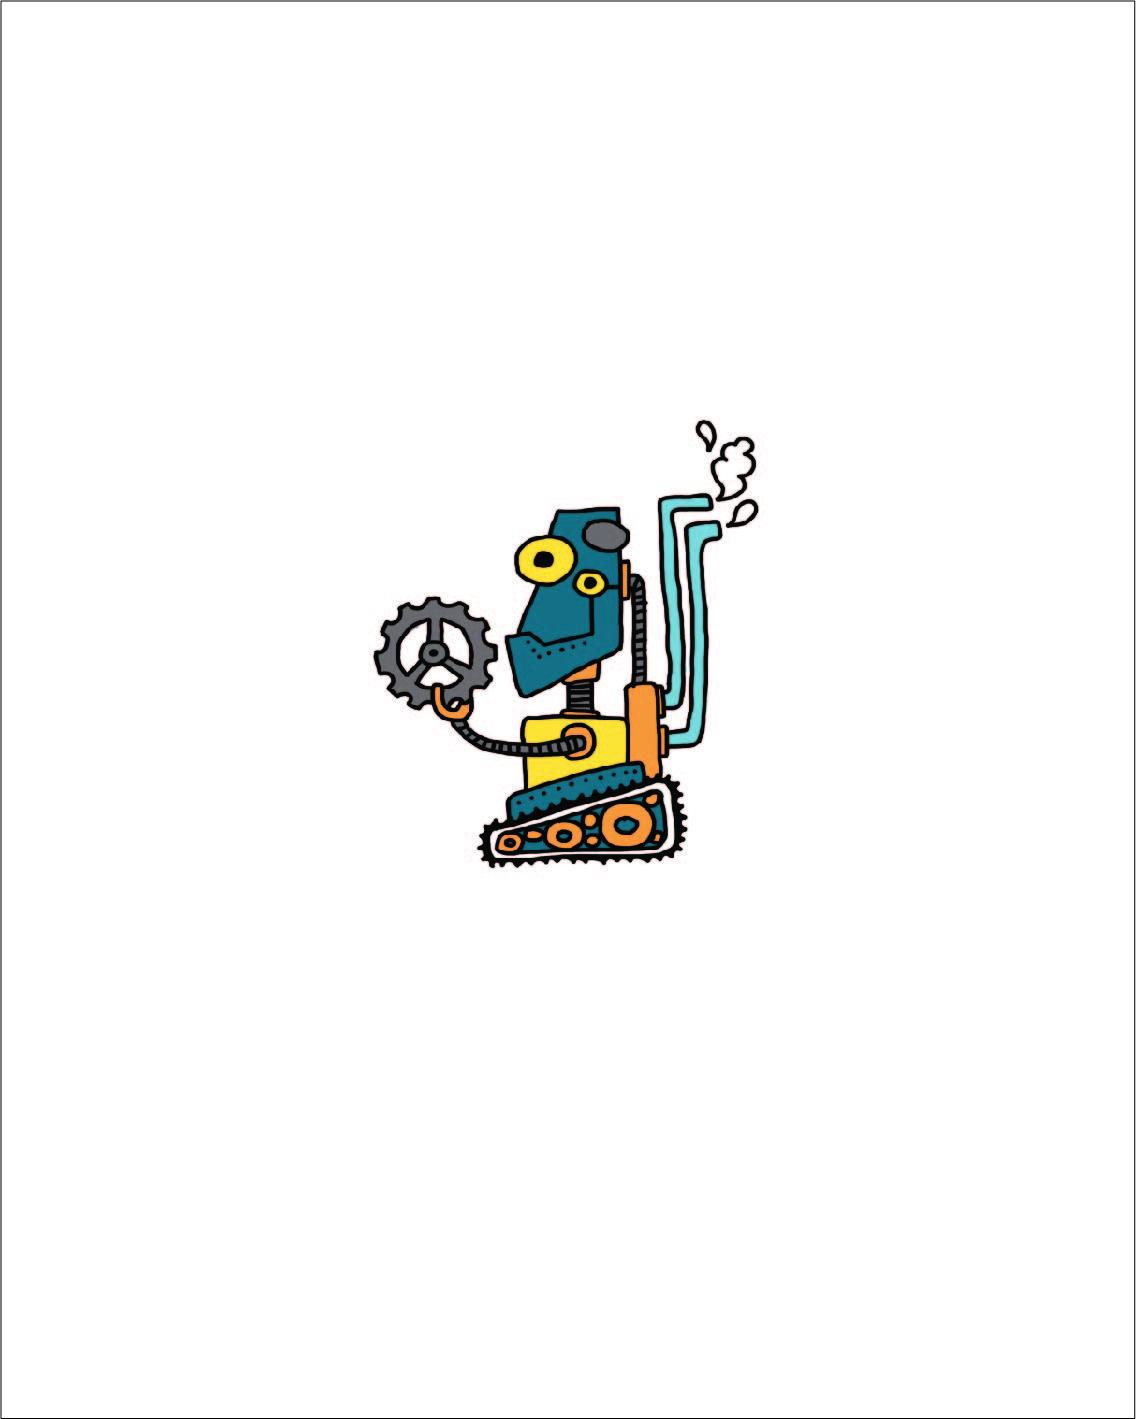 tessuto-felpa-pannello-l-40x55-robot-bob